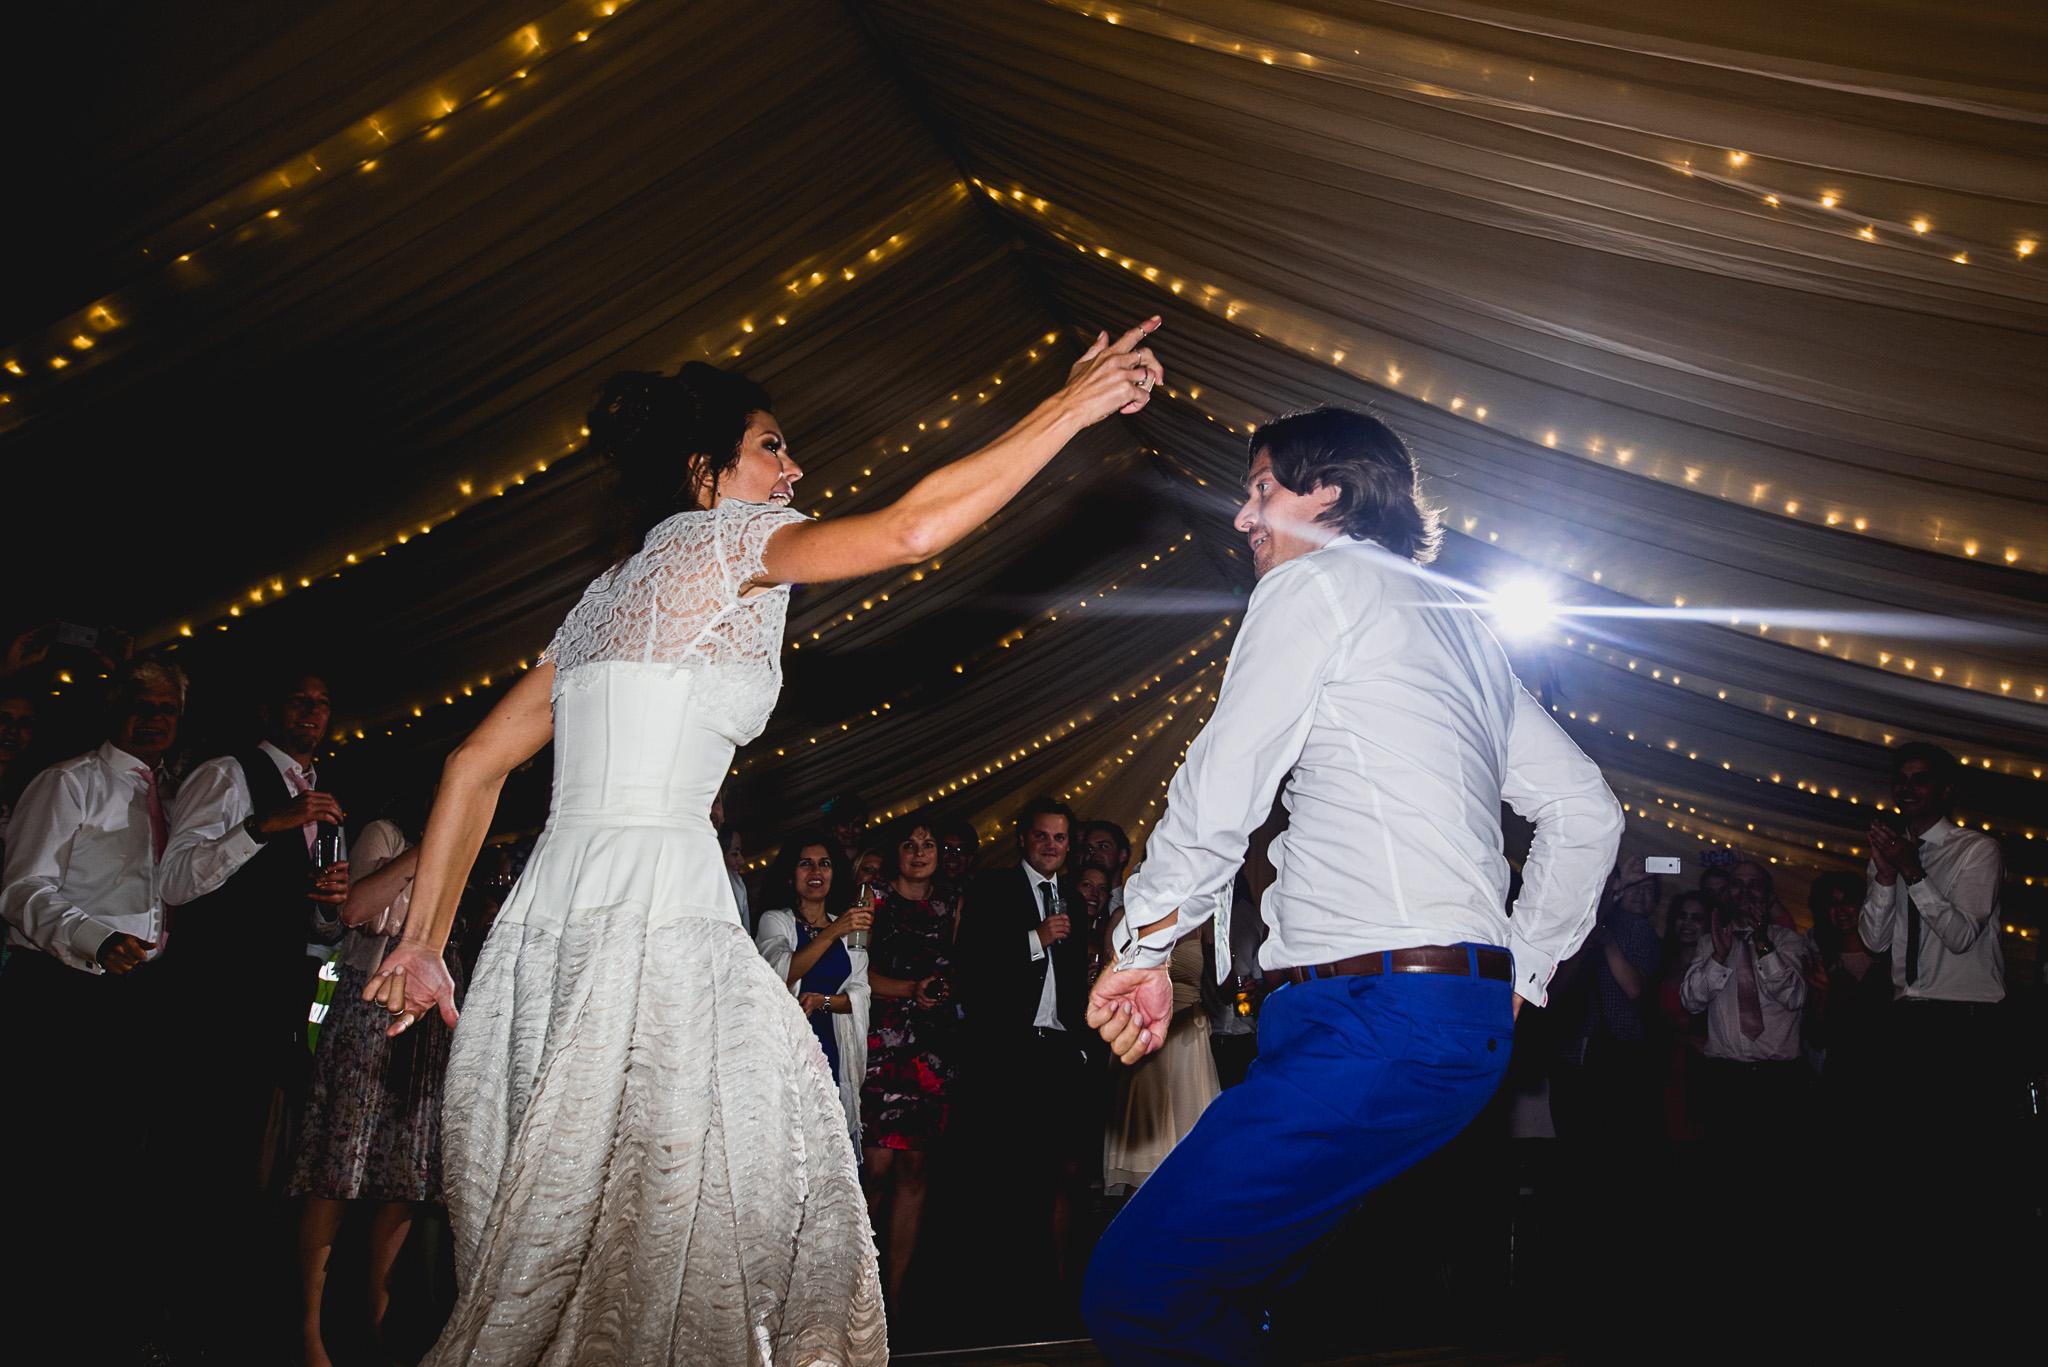 Lara & Jack Wedding 220815 by Barney Walters_1054_BW2_1046